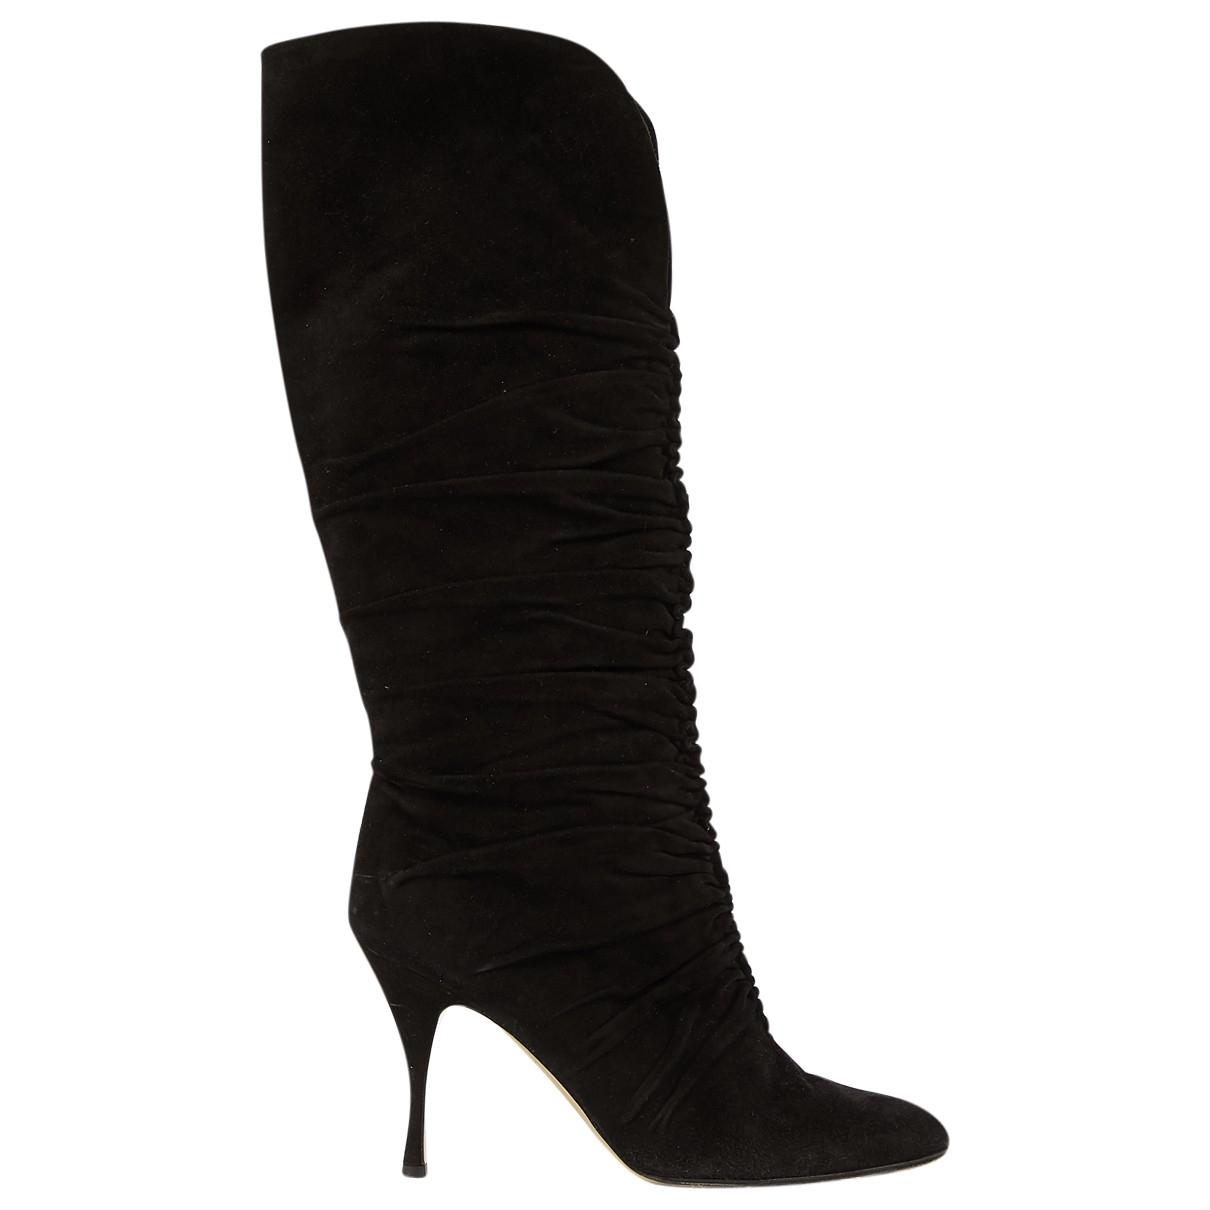 Dolce & Gabbana \N Black Suede Boots for Women 41 EU